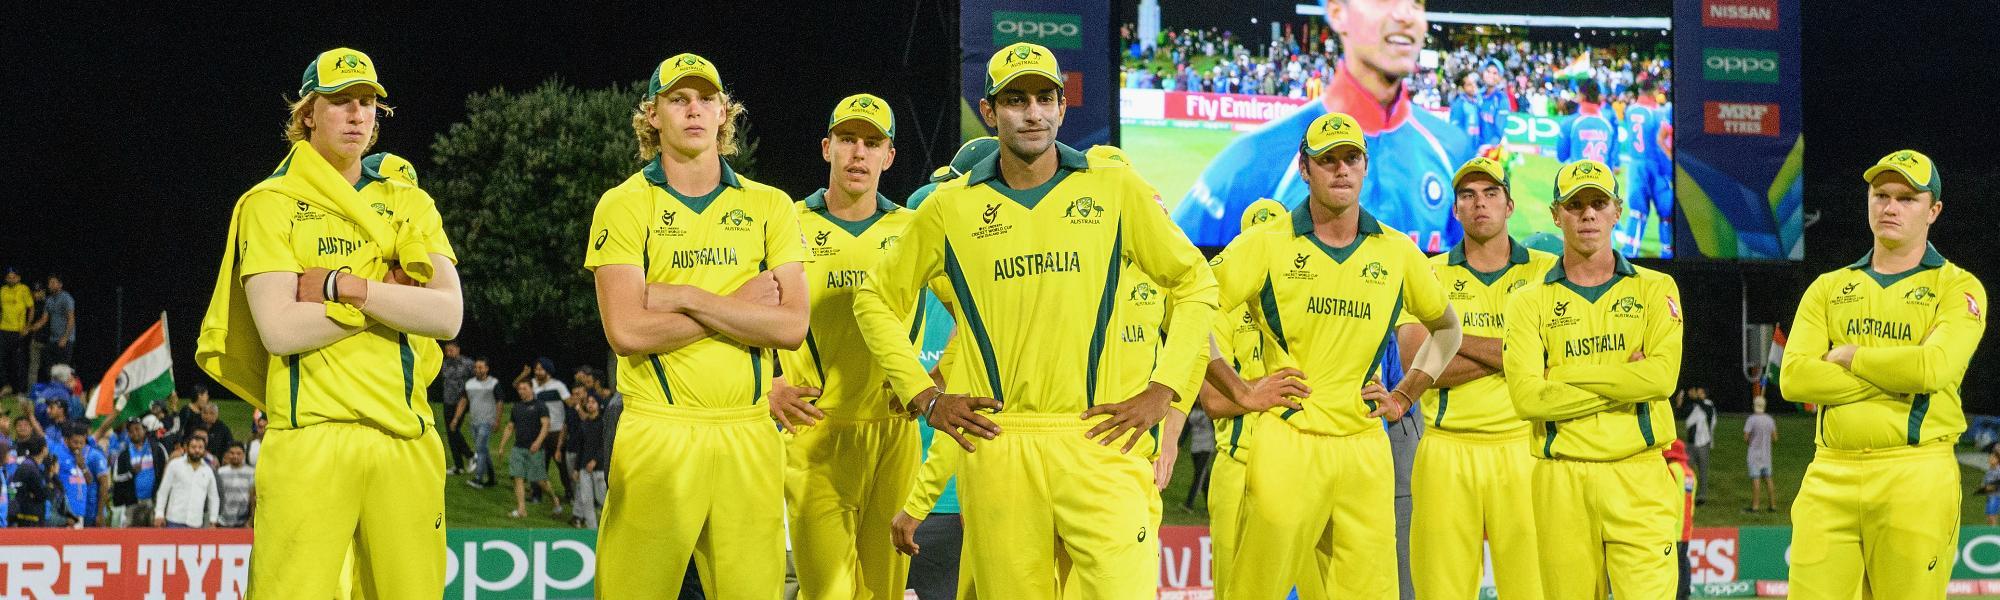 Australia Under-19 team